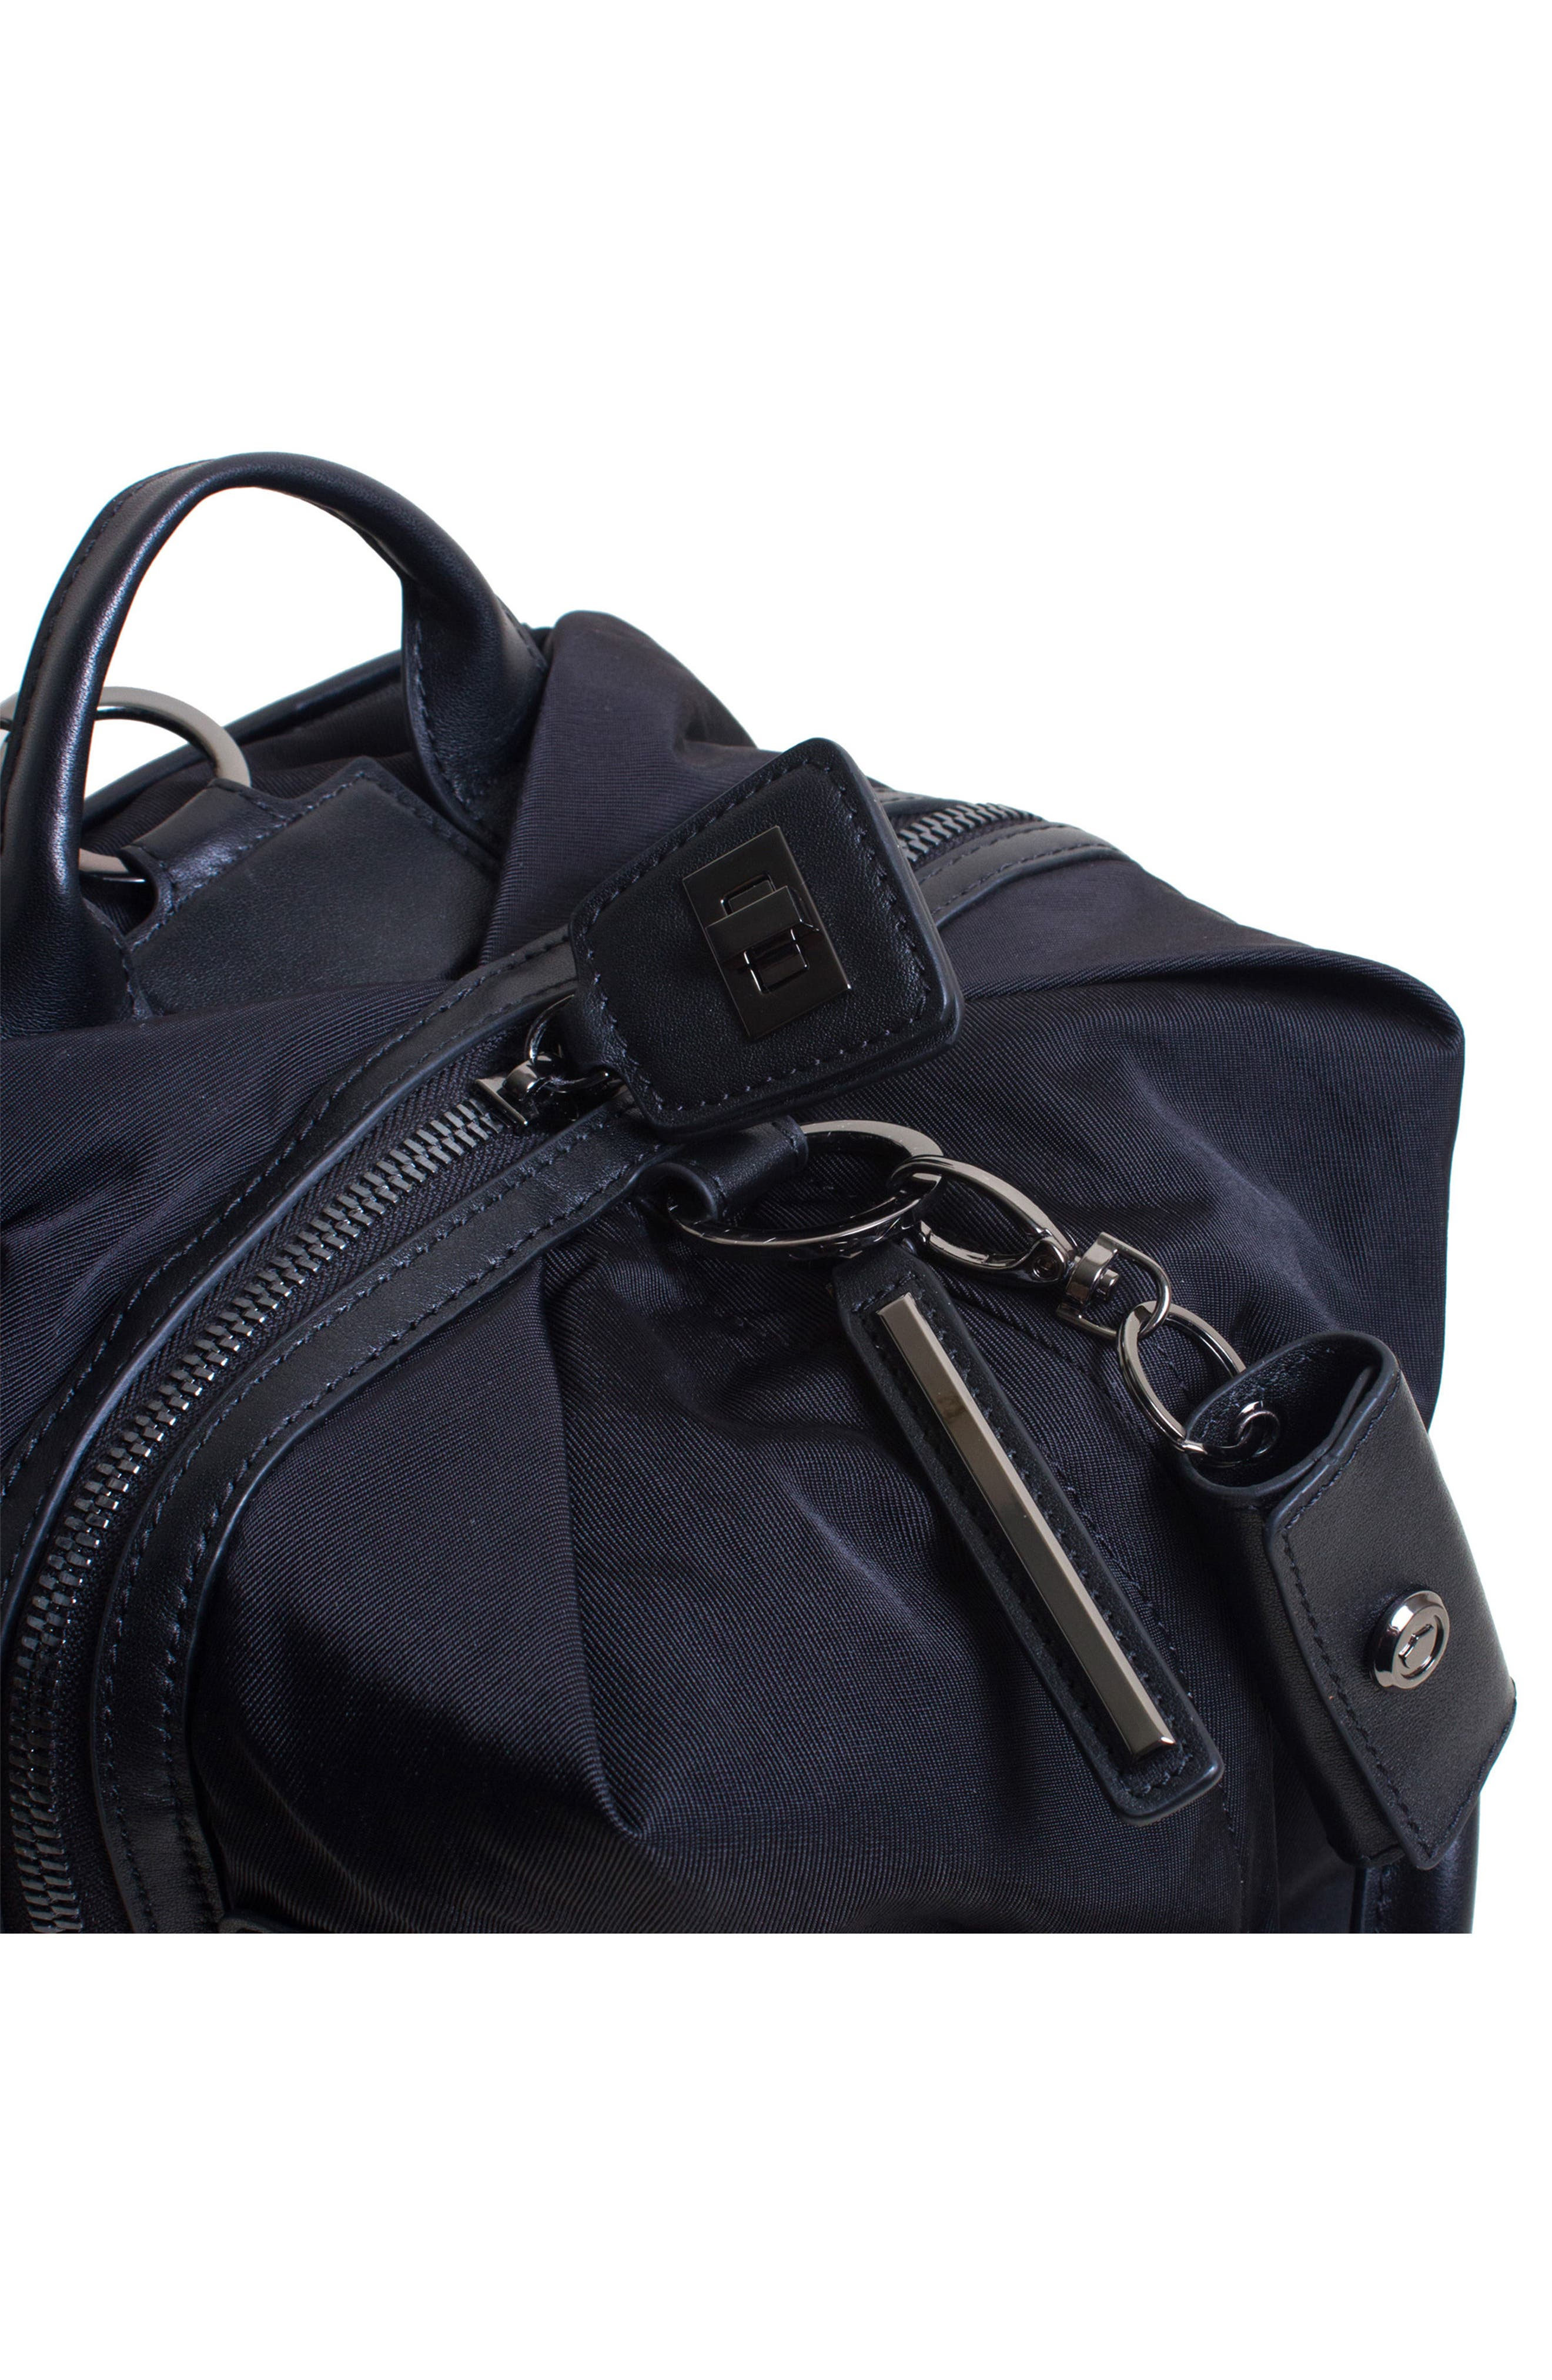 Studio Medium Duffel Backpack,                             Alternate thumbnail 6, color,                             001